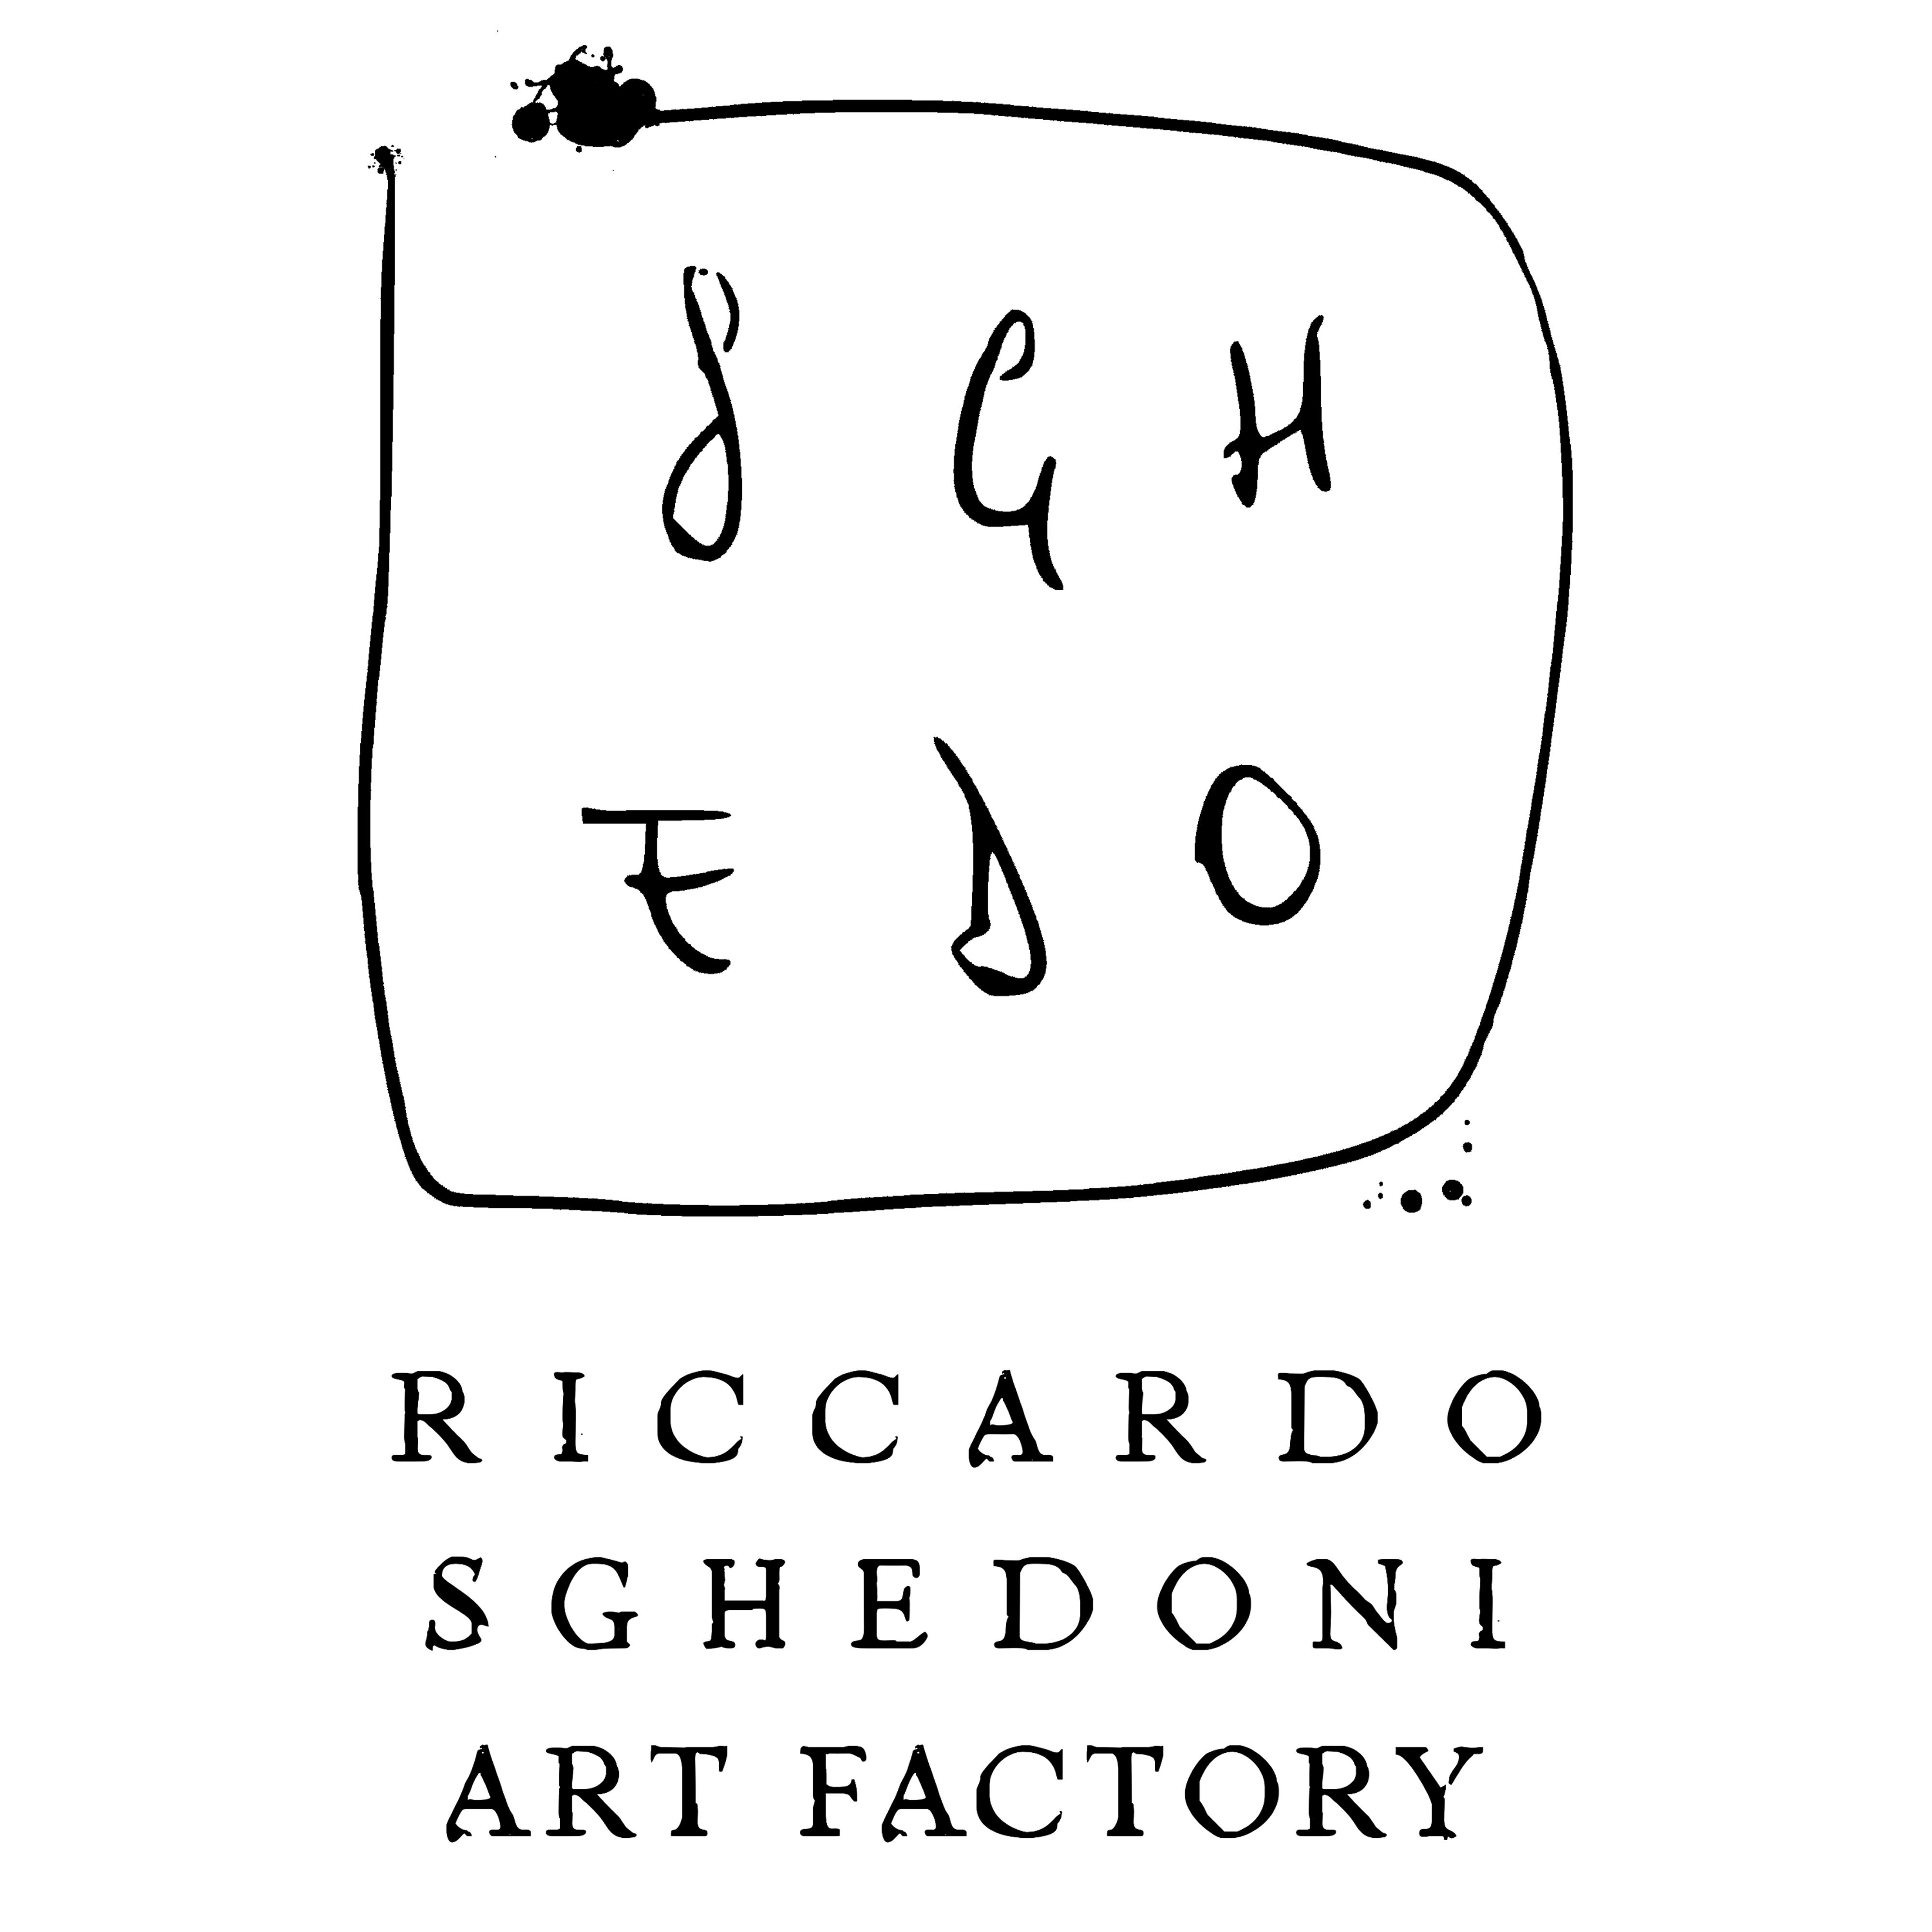 Riccardo Sghedoni Art Factory